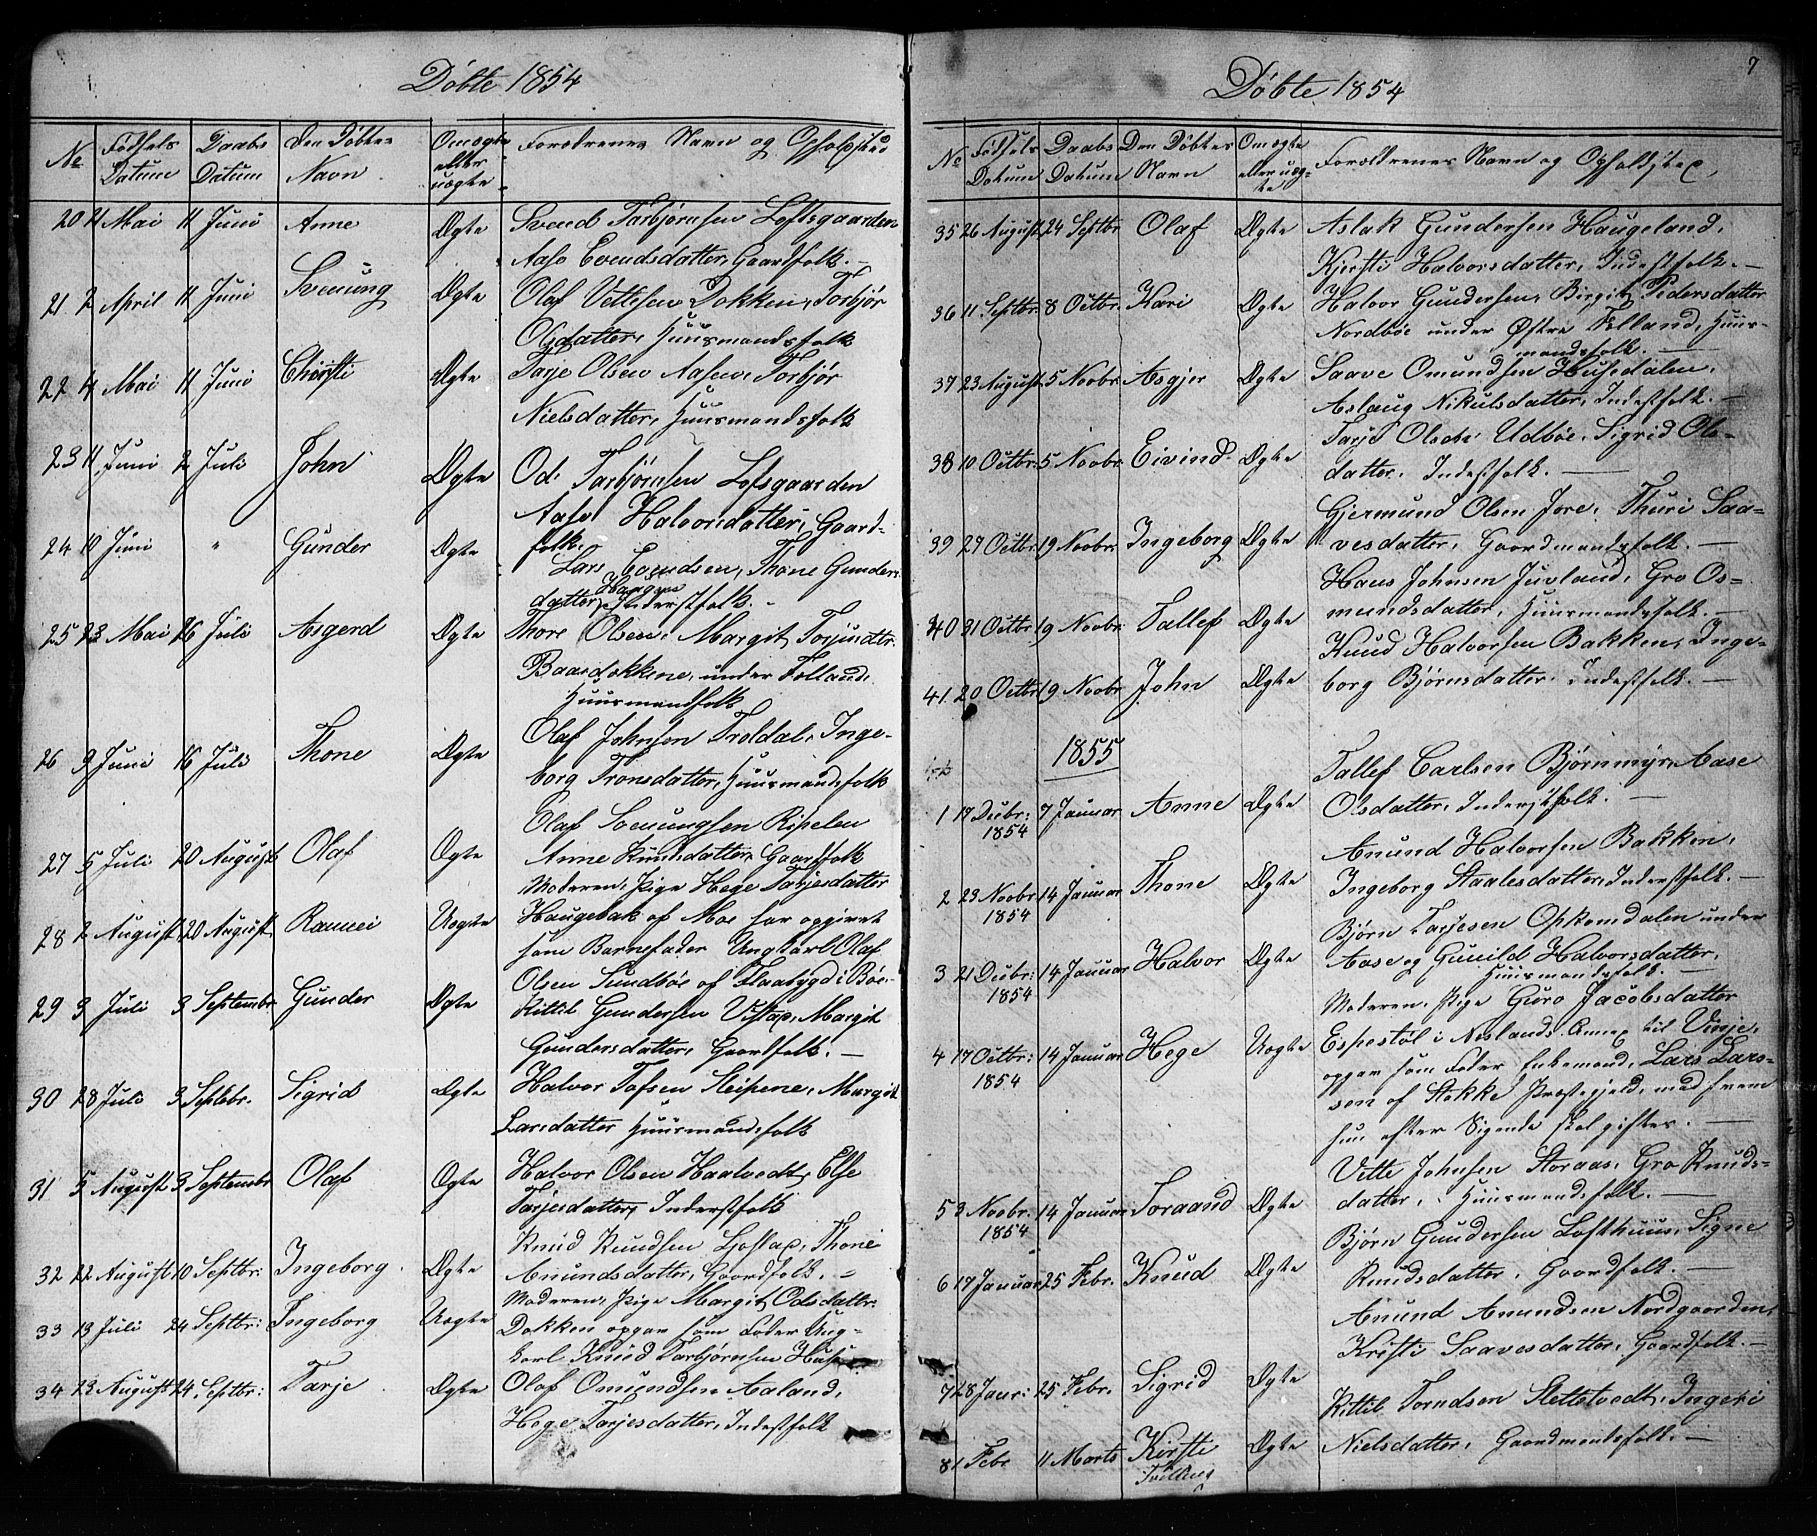 SAKO, Mo kirkebøker, G/Ga/L0001: Klokkerbok nr. I 1, 1851-1891, s. 7